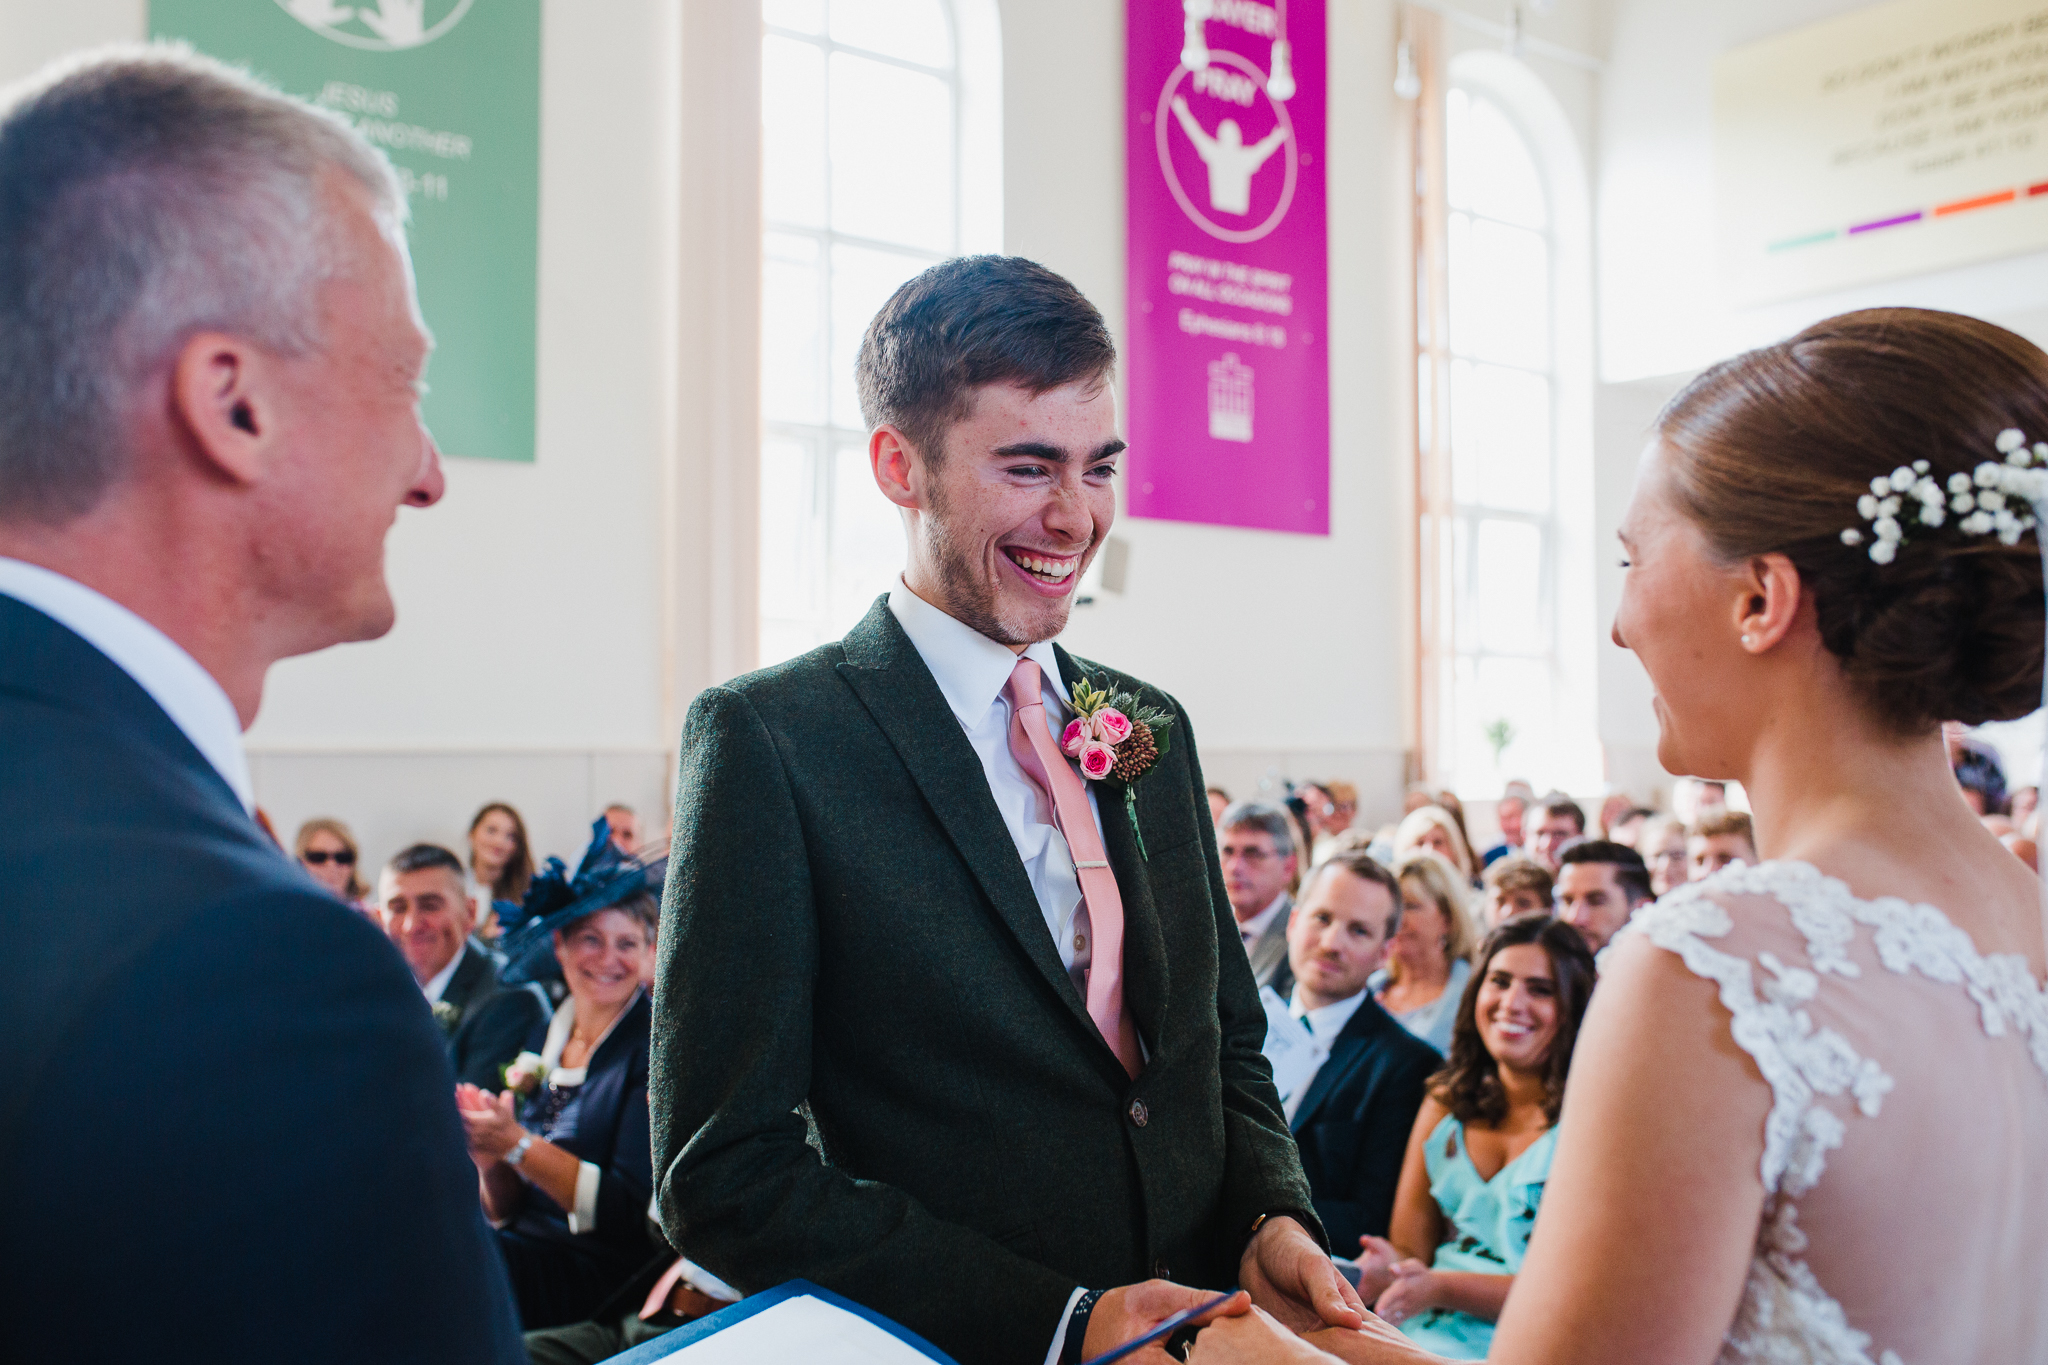 Jess and Ben - Liverpool wedding - Ben saying his vows